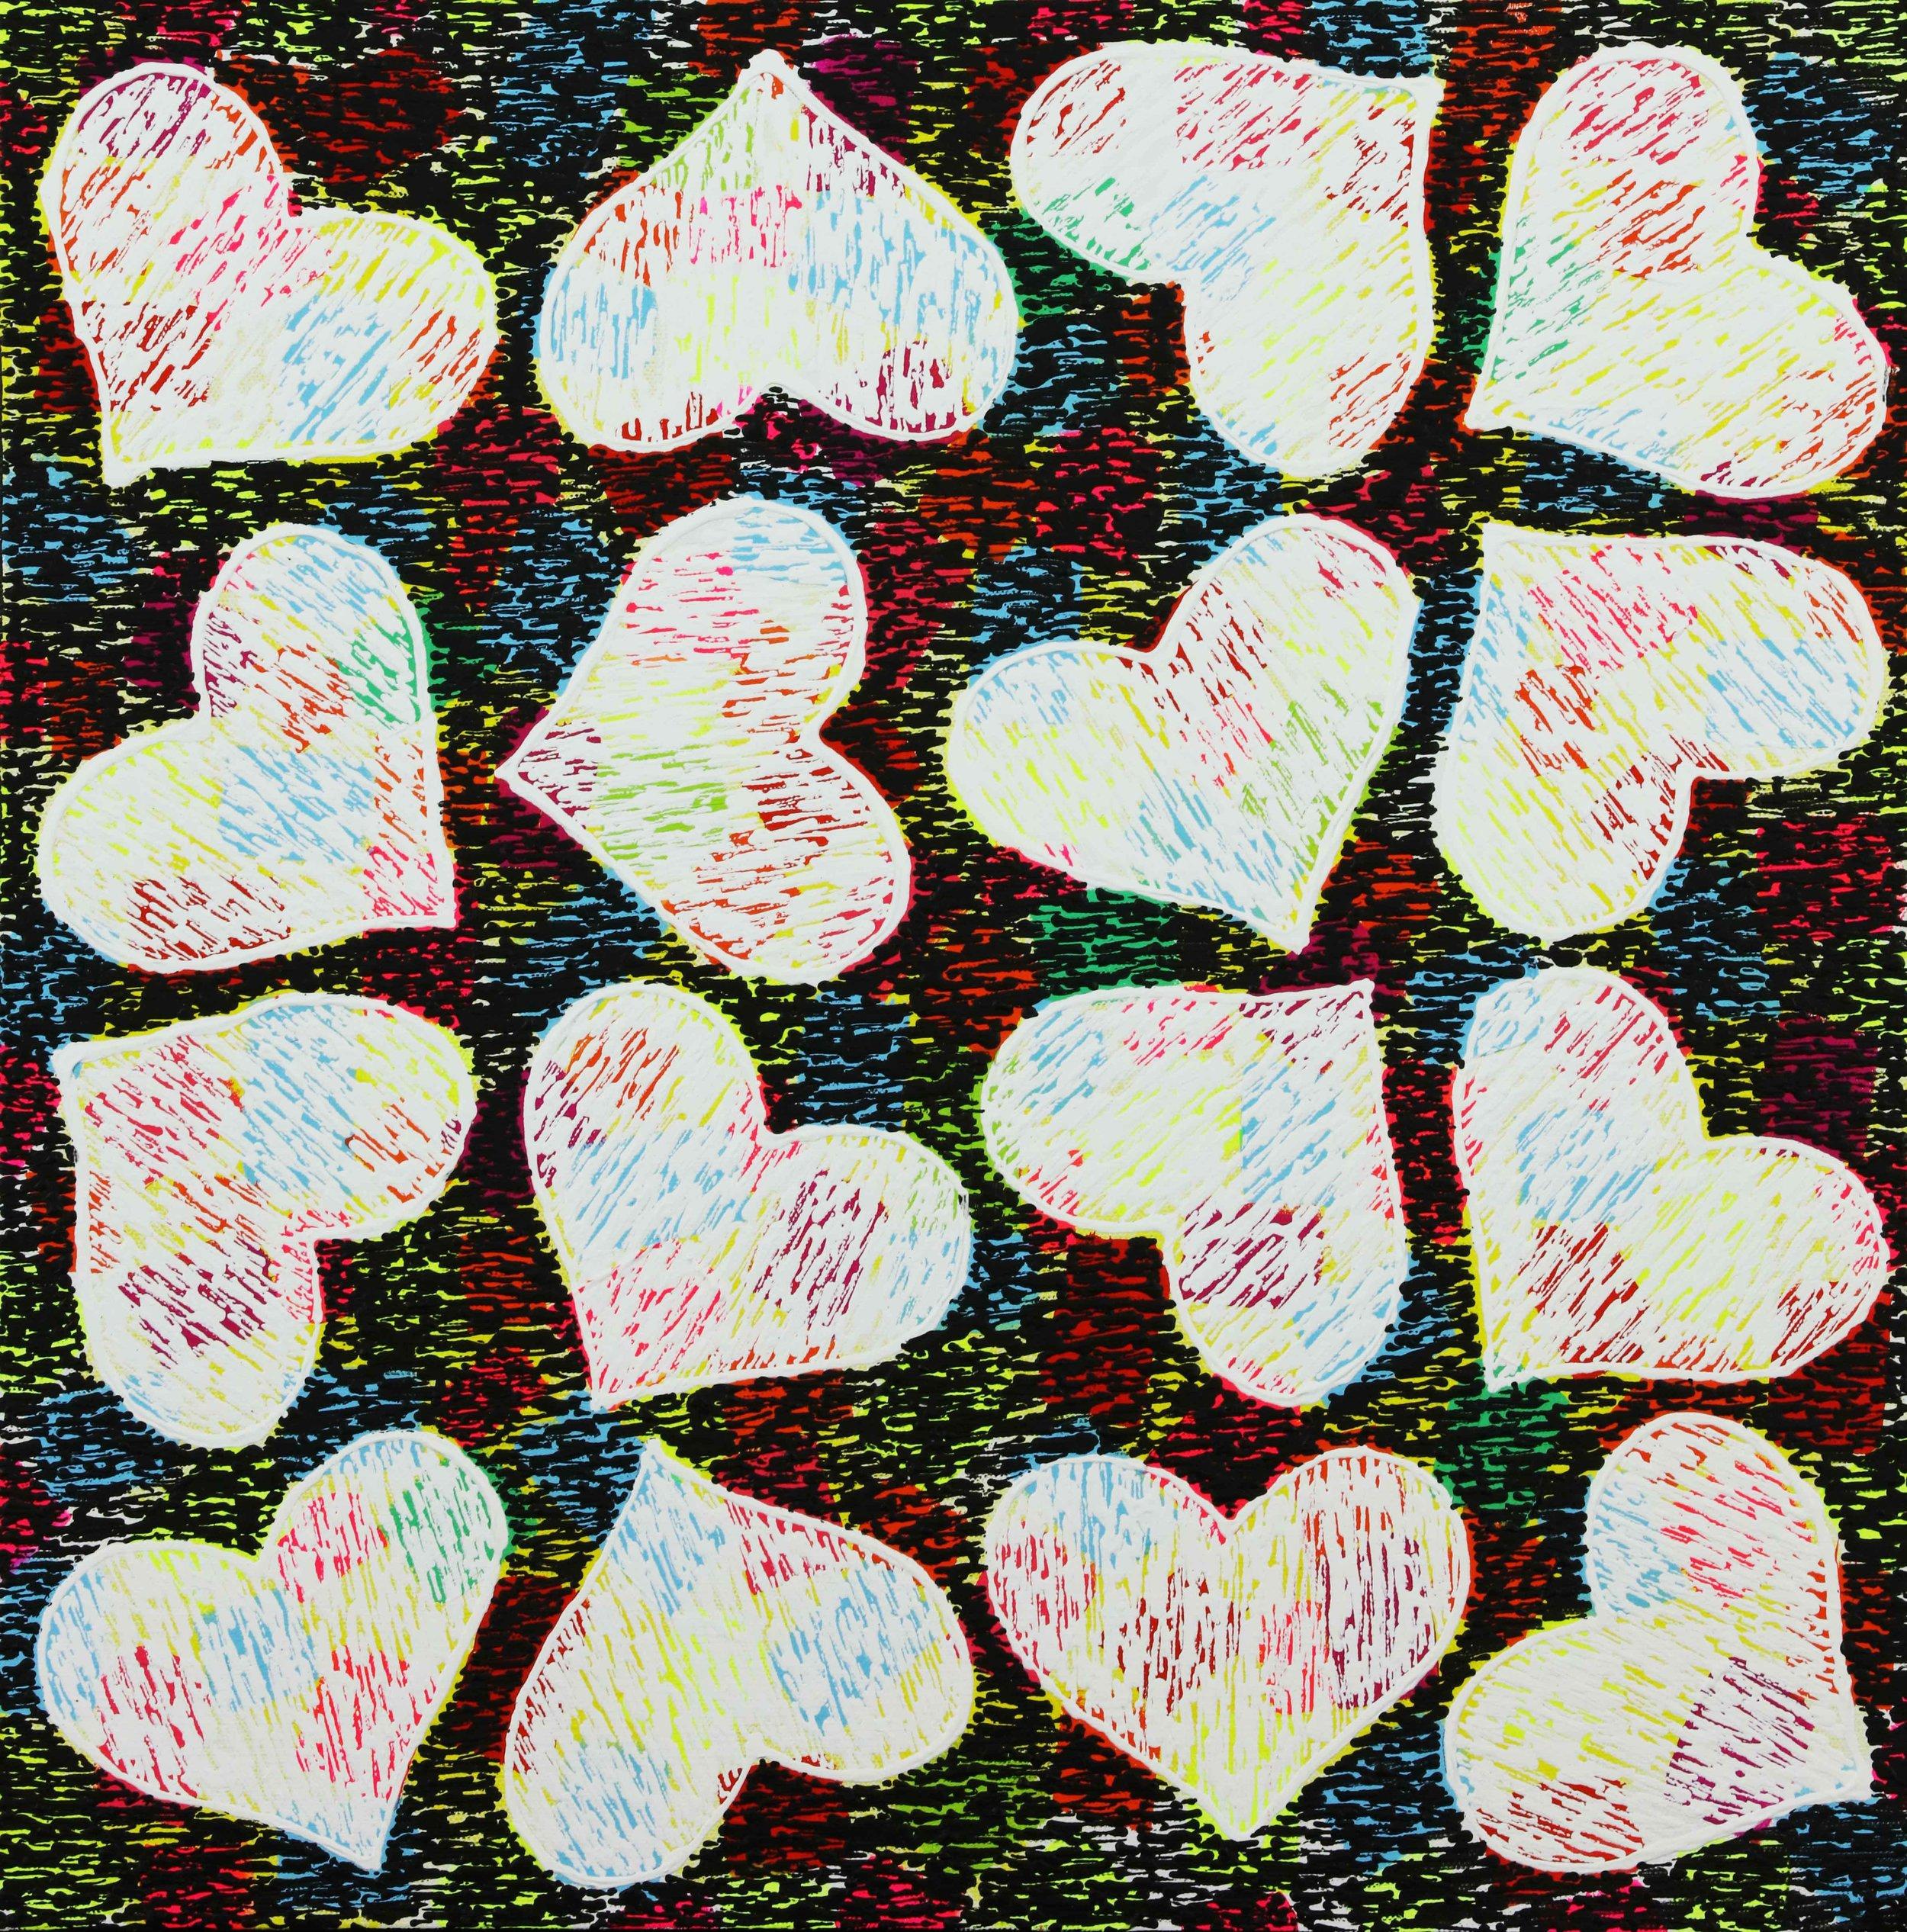 "Colors of Love- 20""H x 20""W x 2.5""D"